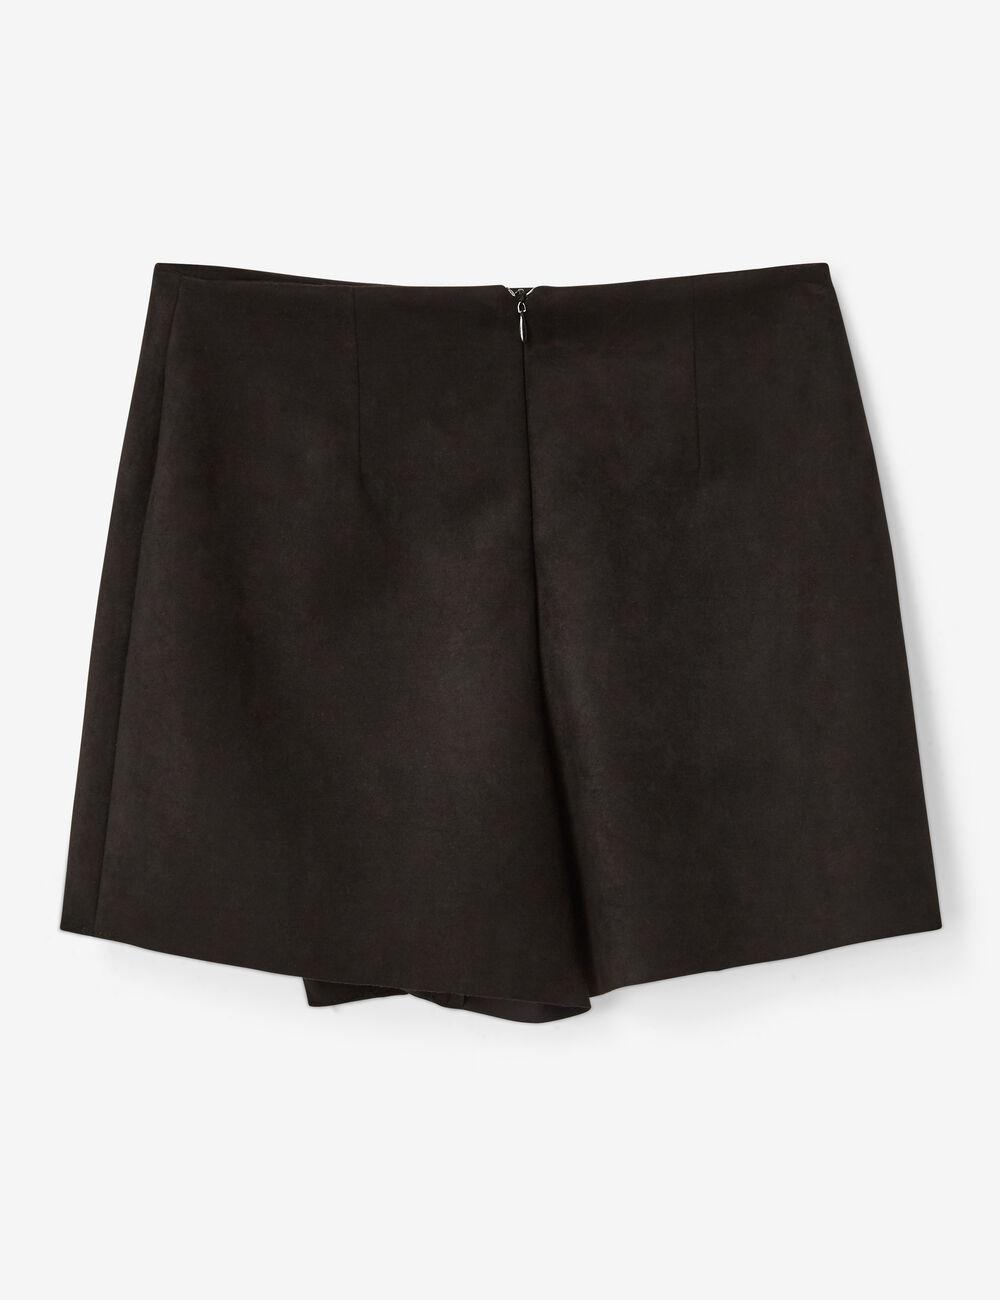 Jupe short en suédine noire femme • Jennyfer 93987a2fbf7